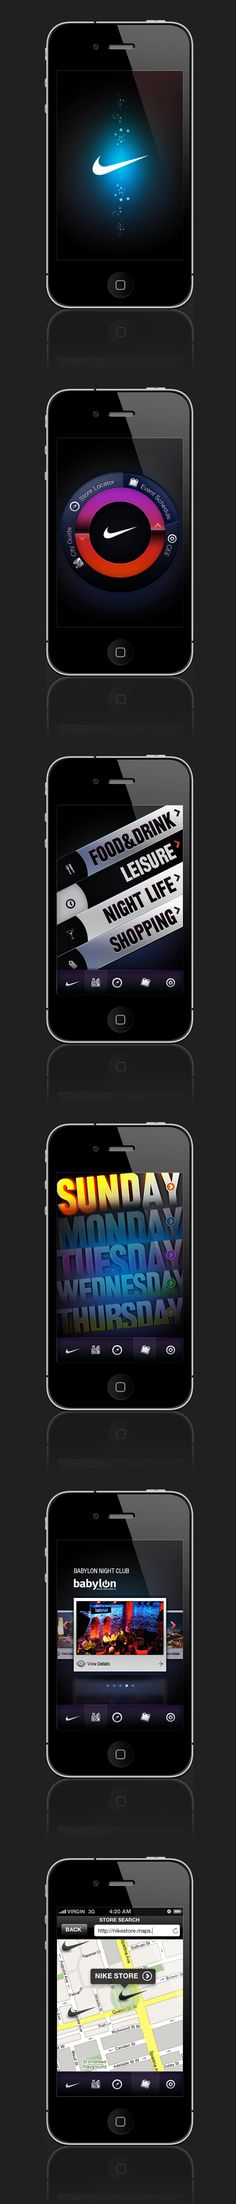 NIKE iPHONE UI by Ersin ANTEP